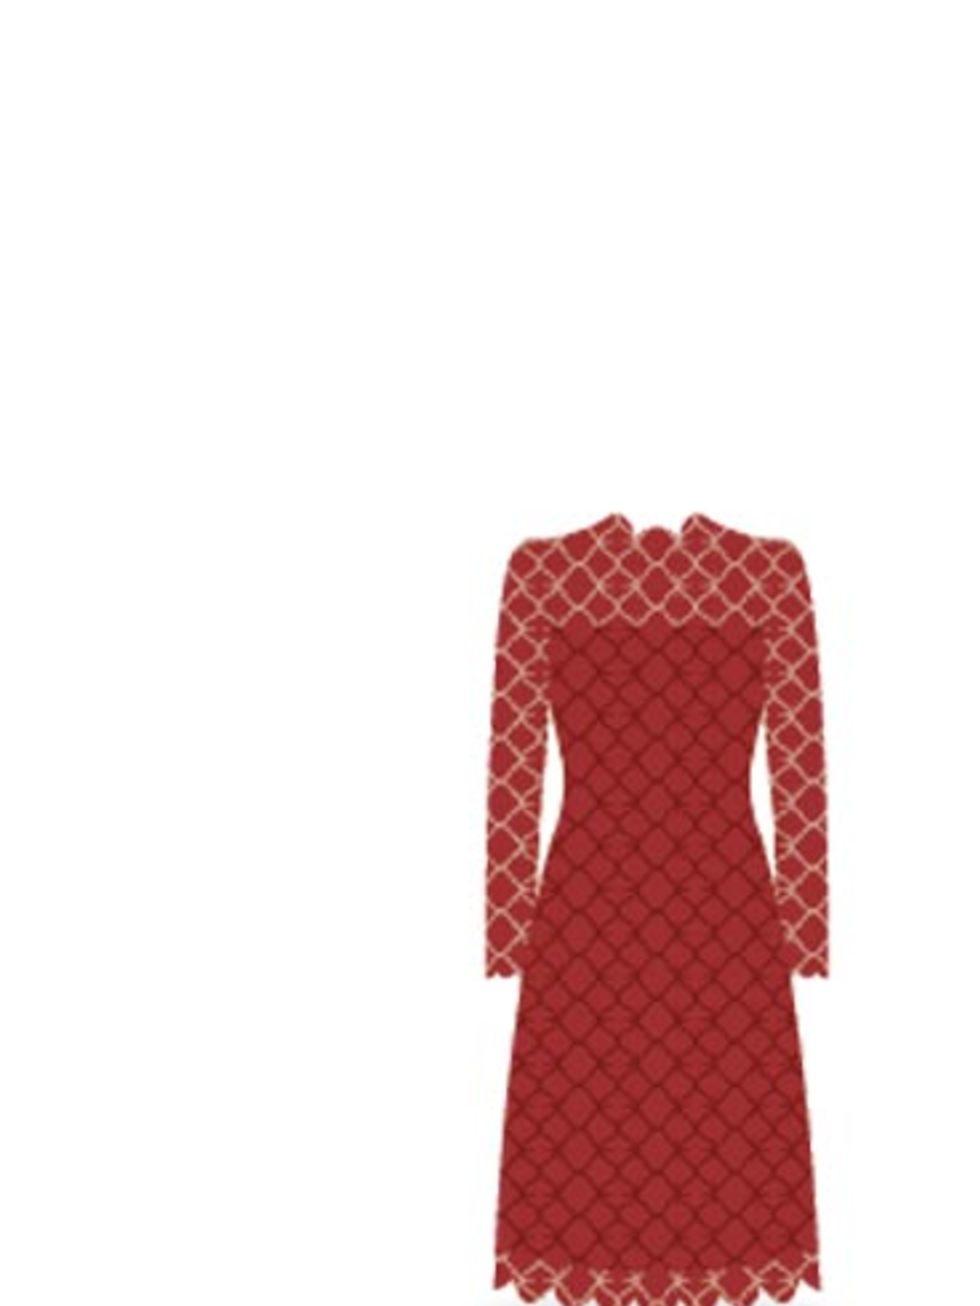 Red dress emoji costume national cologne